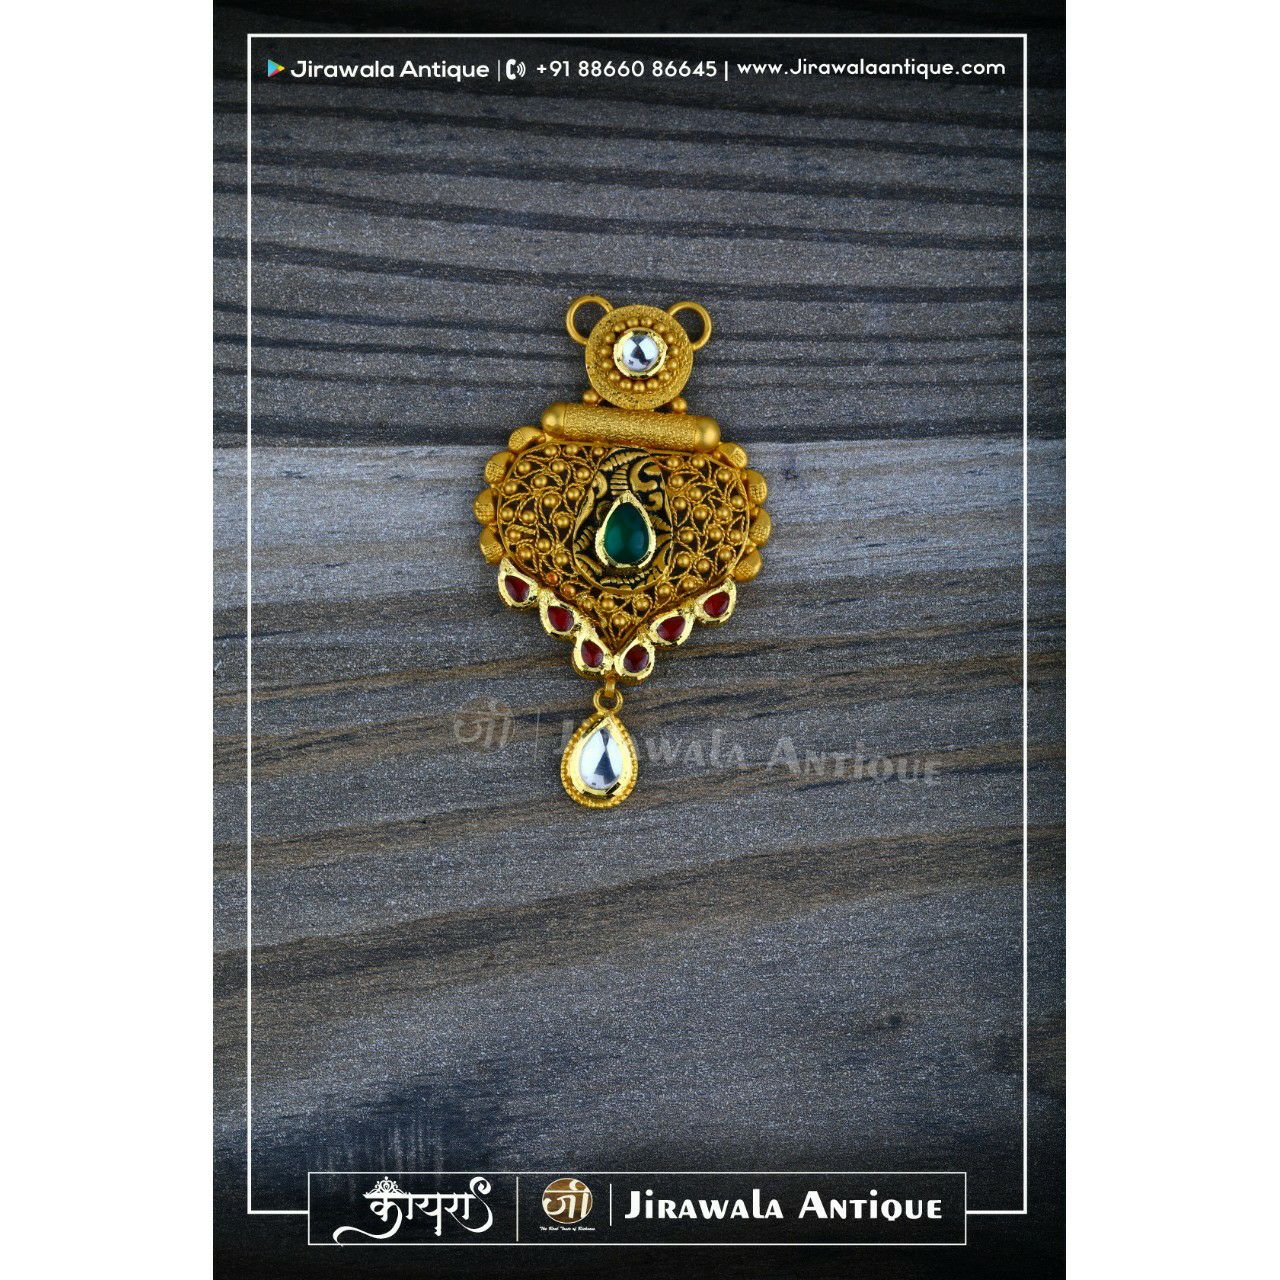 Antique gold jadau mangalsutra pendant with beni work.